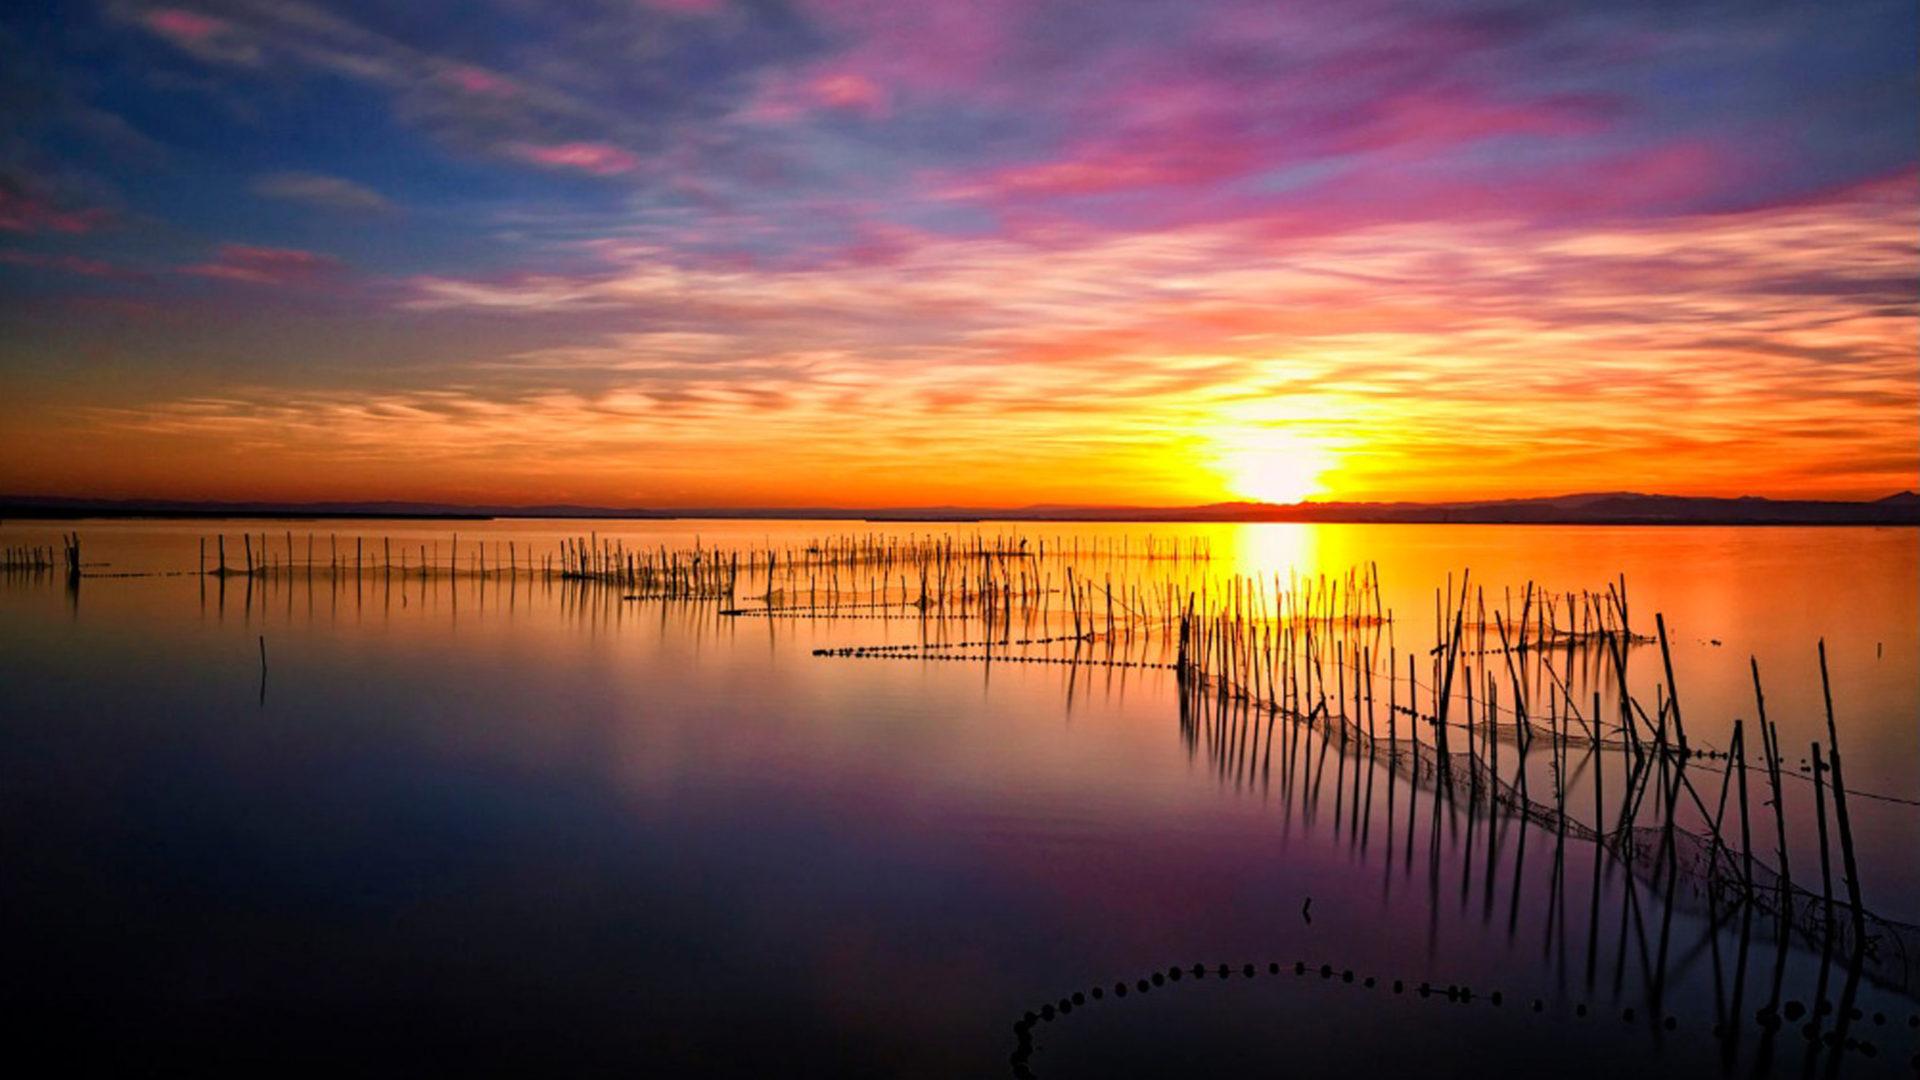 Iphone Pretty Wallpaper Magical Sunset Albufera Lake Hd Wallpaper Download For